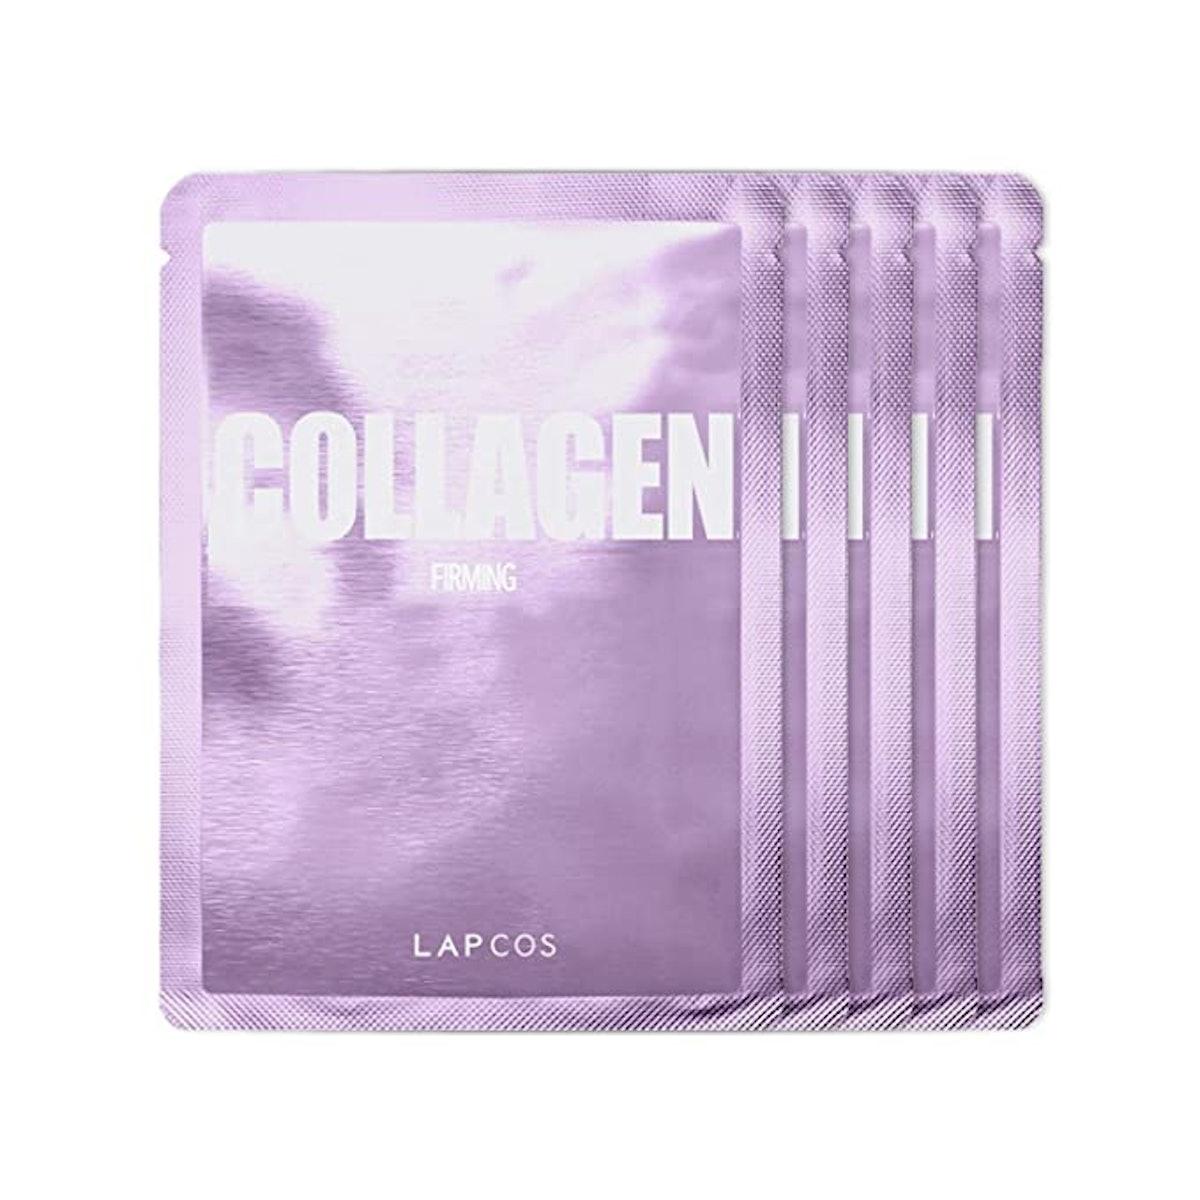 LAPCOS Collagen Sheet Mask (5-Pack)